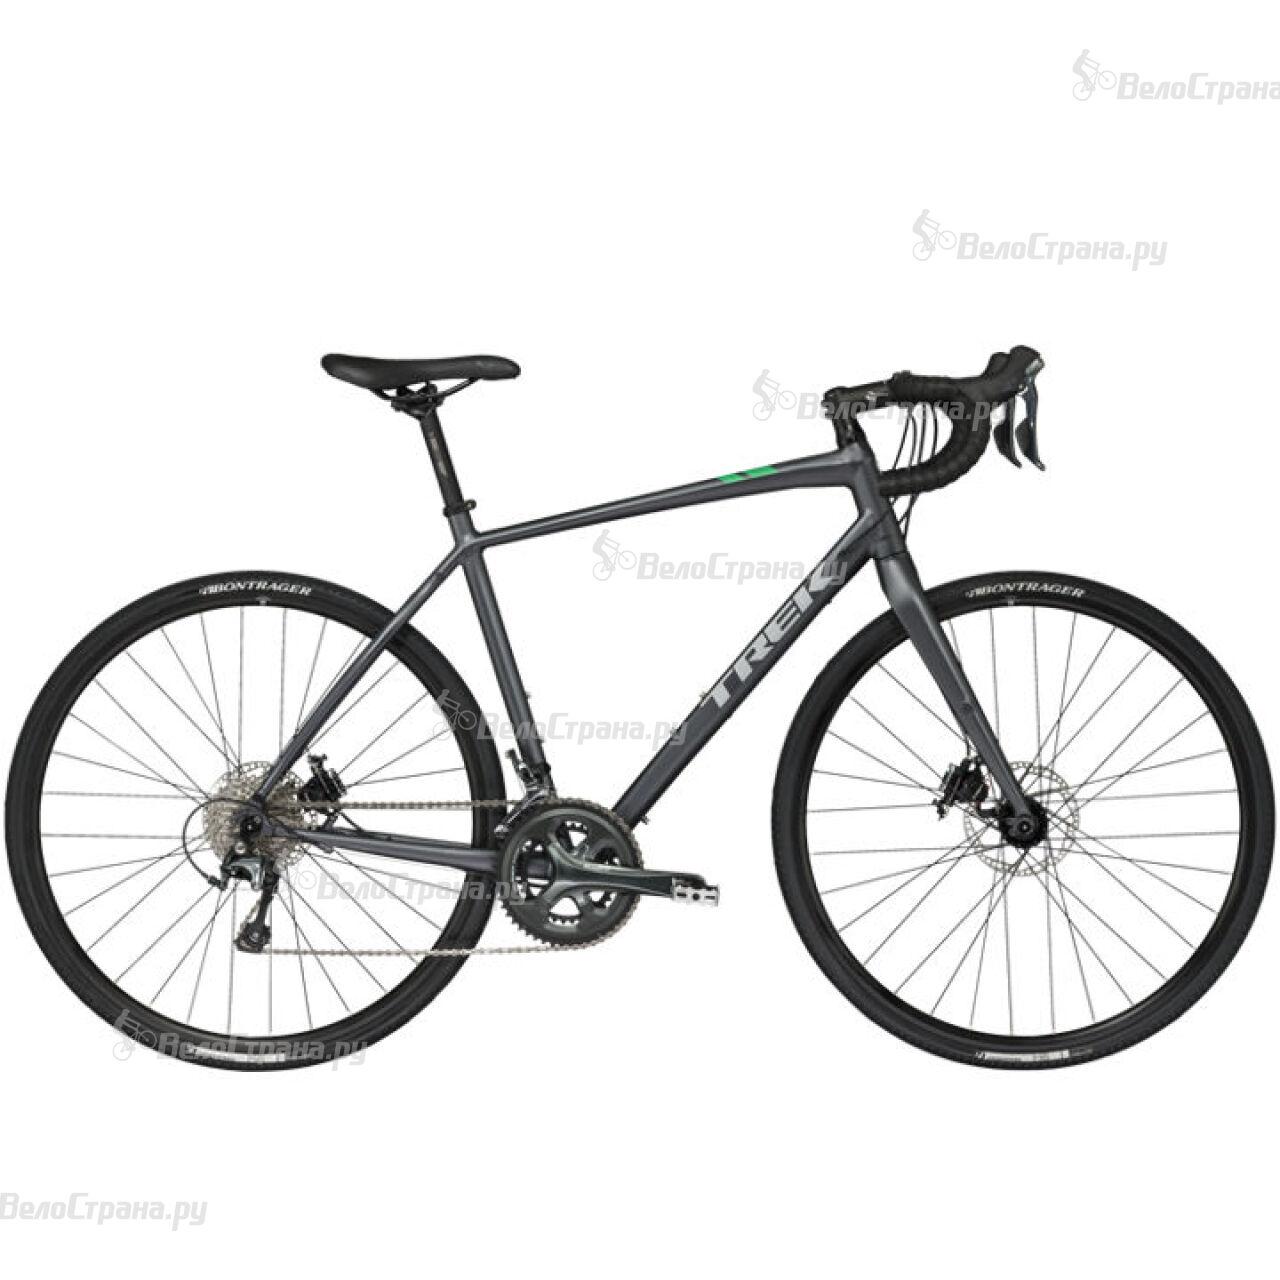 Велосипед Trek CrossRip 2 (2017) велосипед trek crossrip 2013